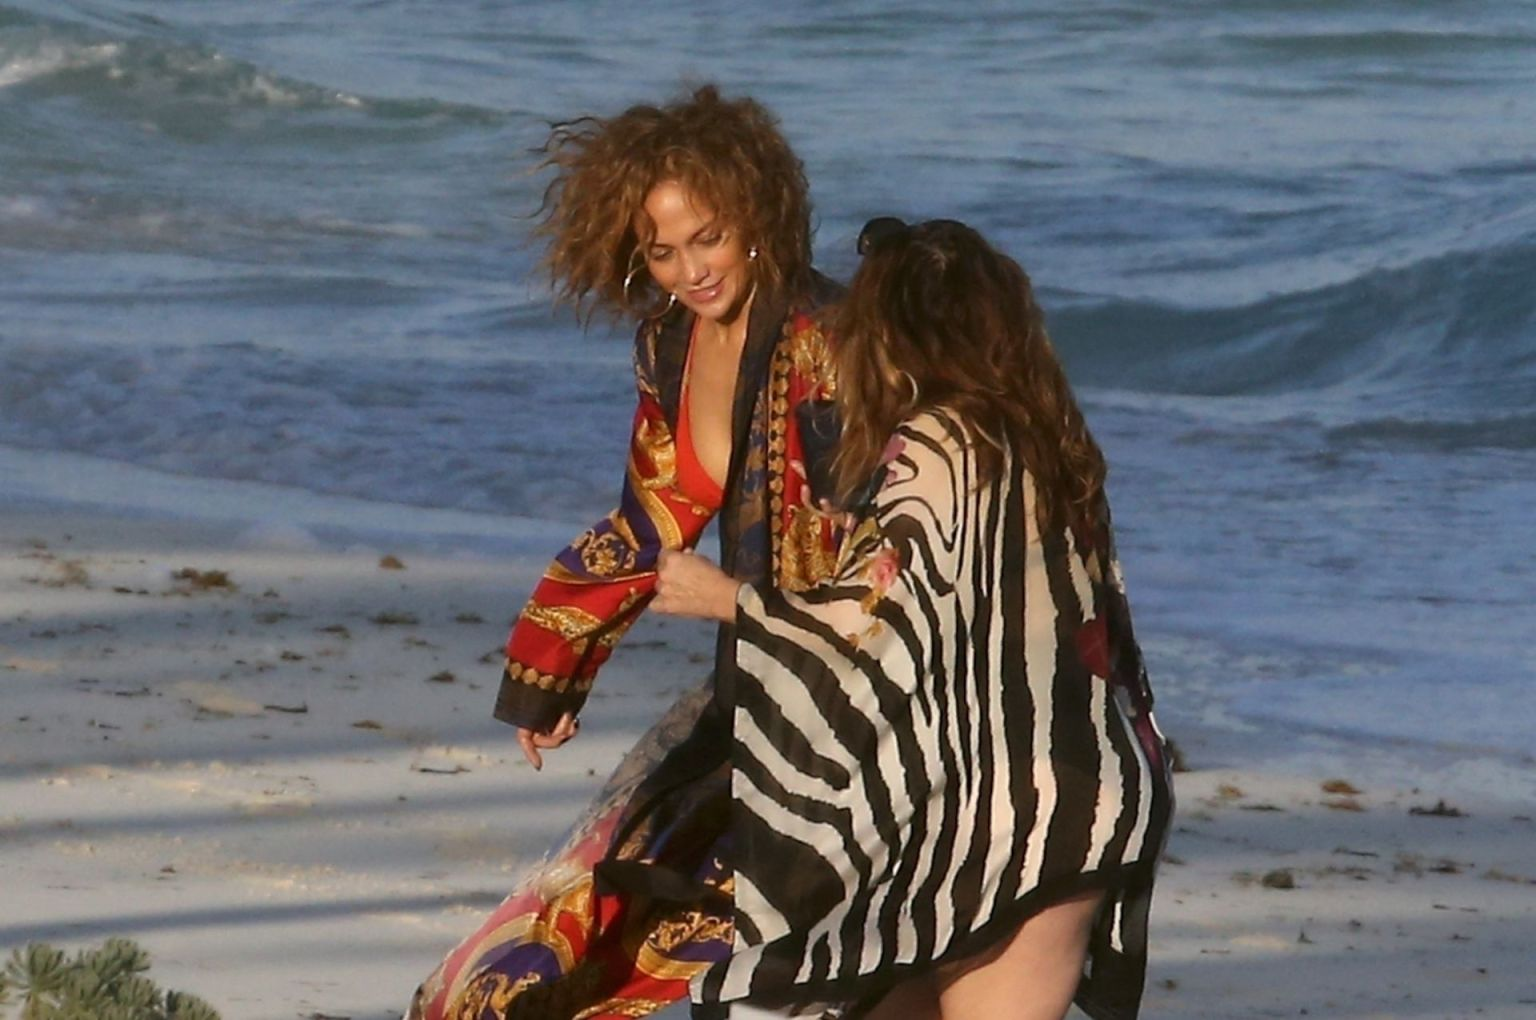 Hot Music Star Beach Bodies | Jennifer lopez bikini